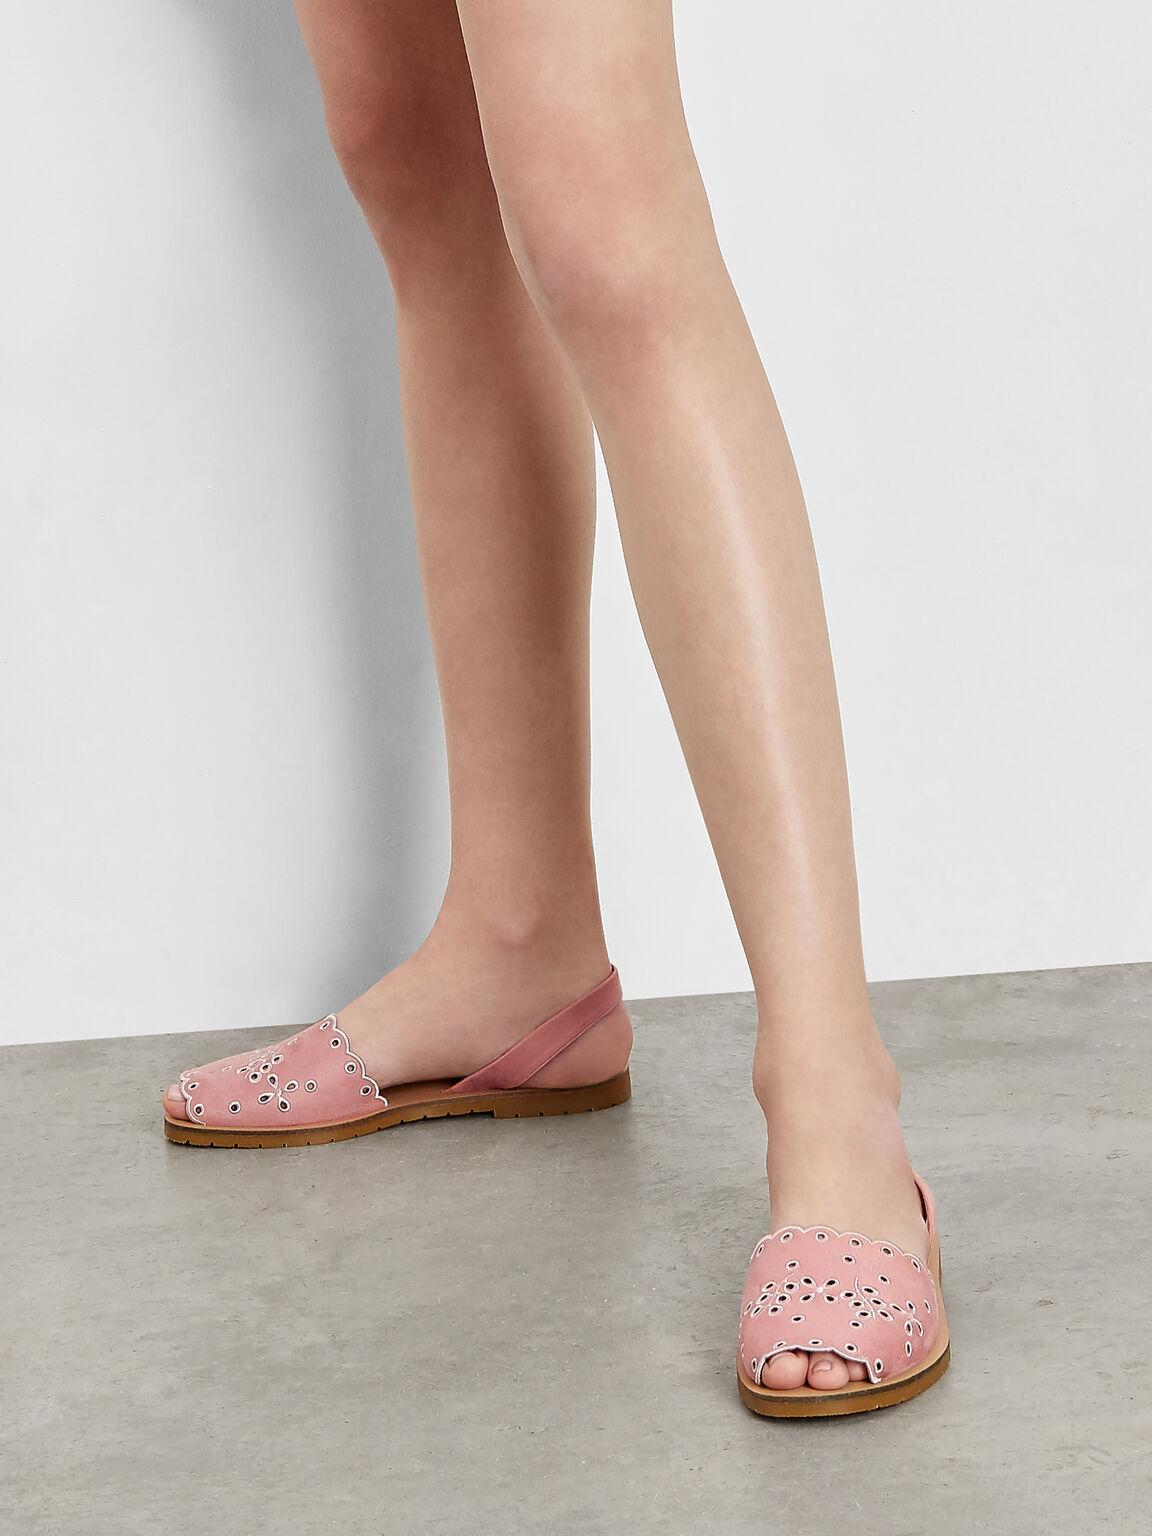 Scalloped Floral Slingback Flats, Pink, hi-res